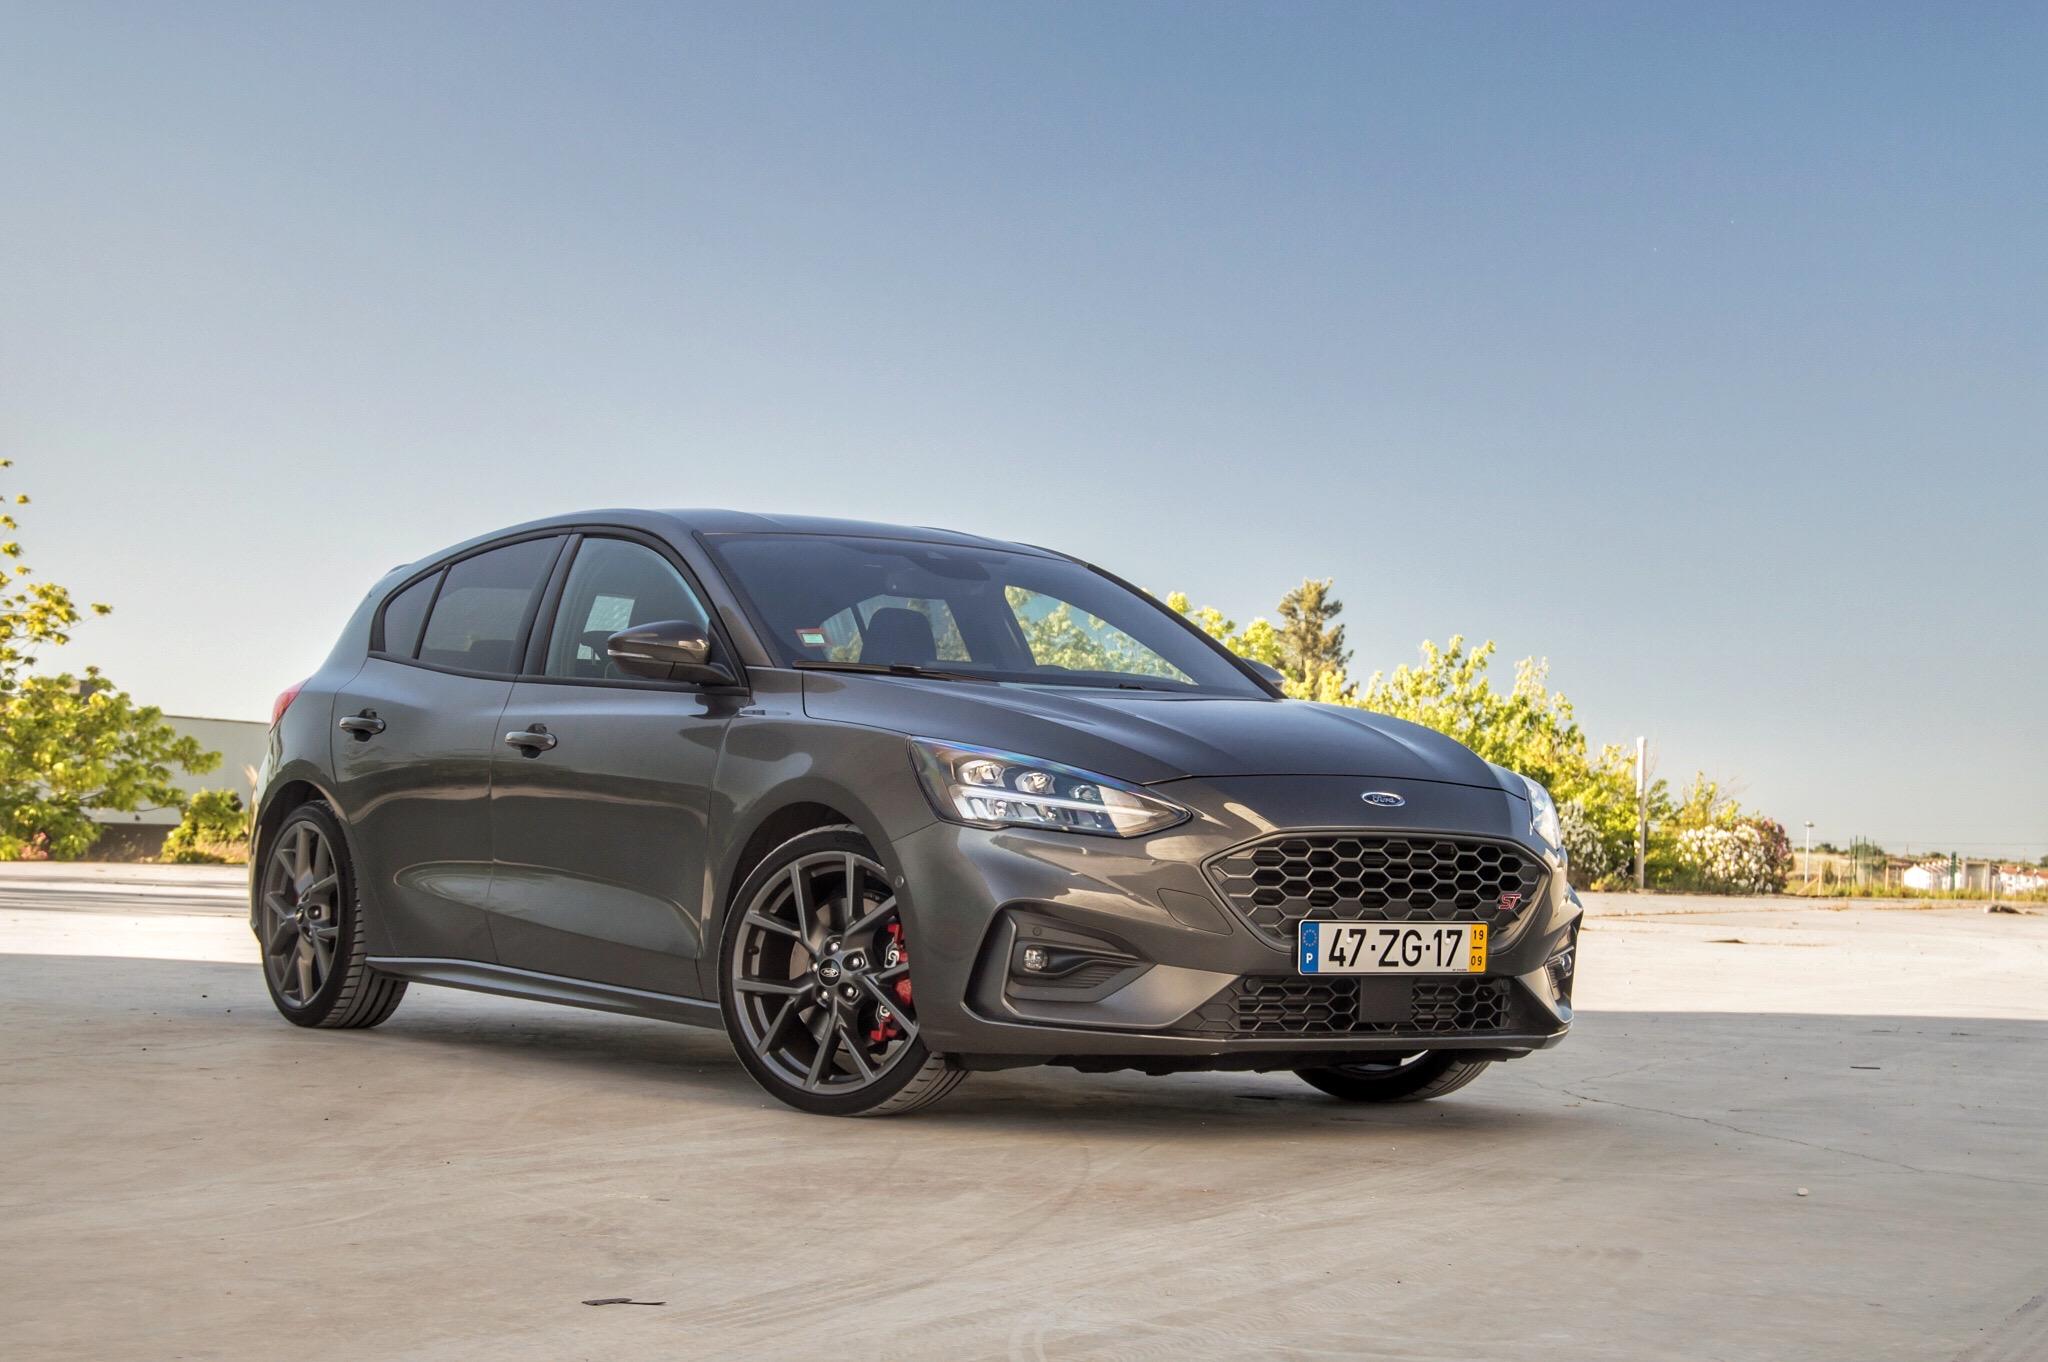 Teste ao Ford Focus mais potente que podes comprar